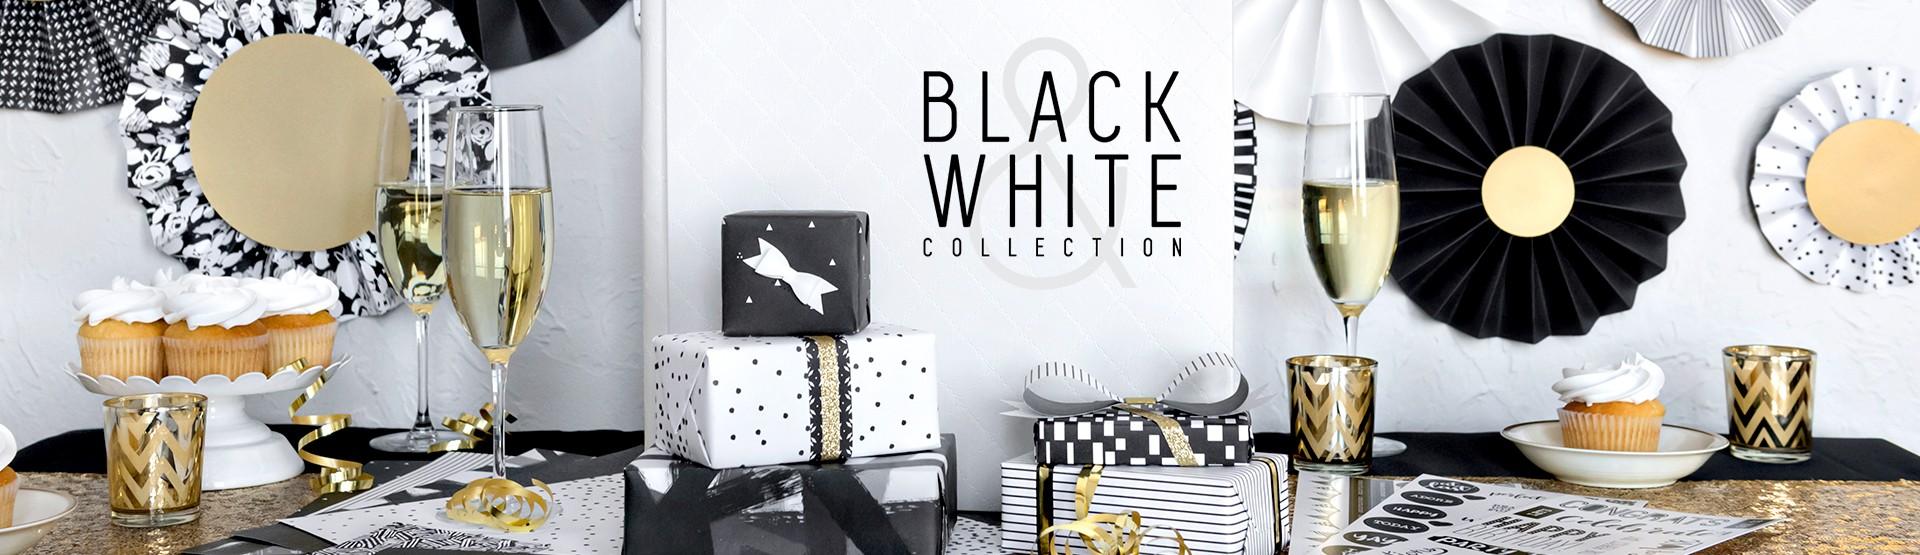 All Occasions: Black & White